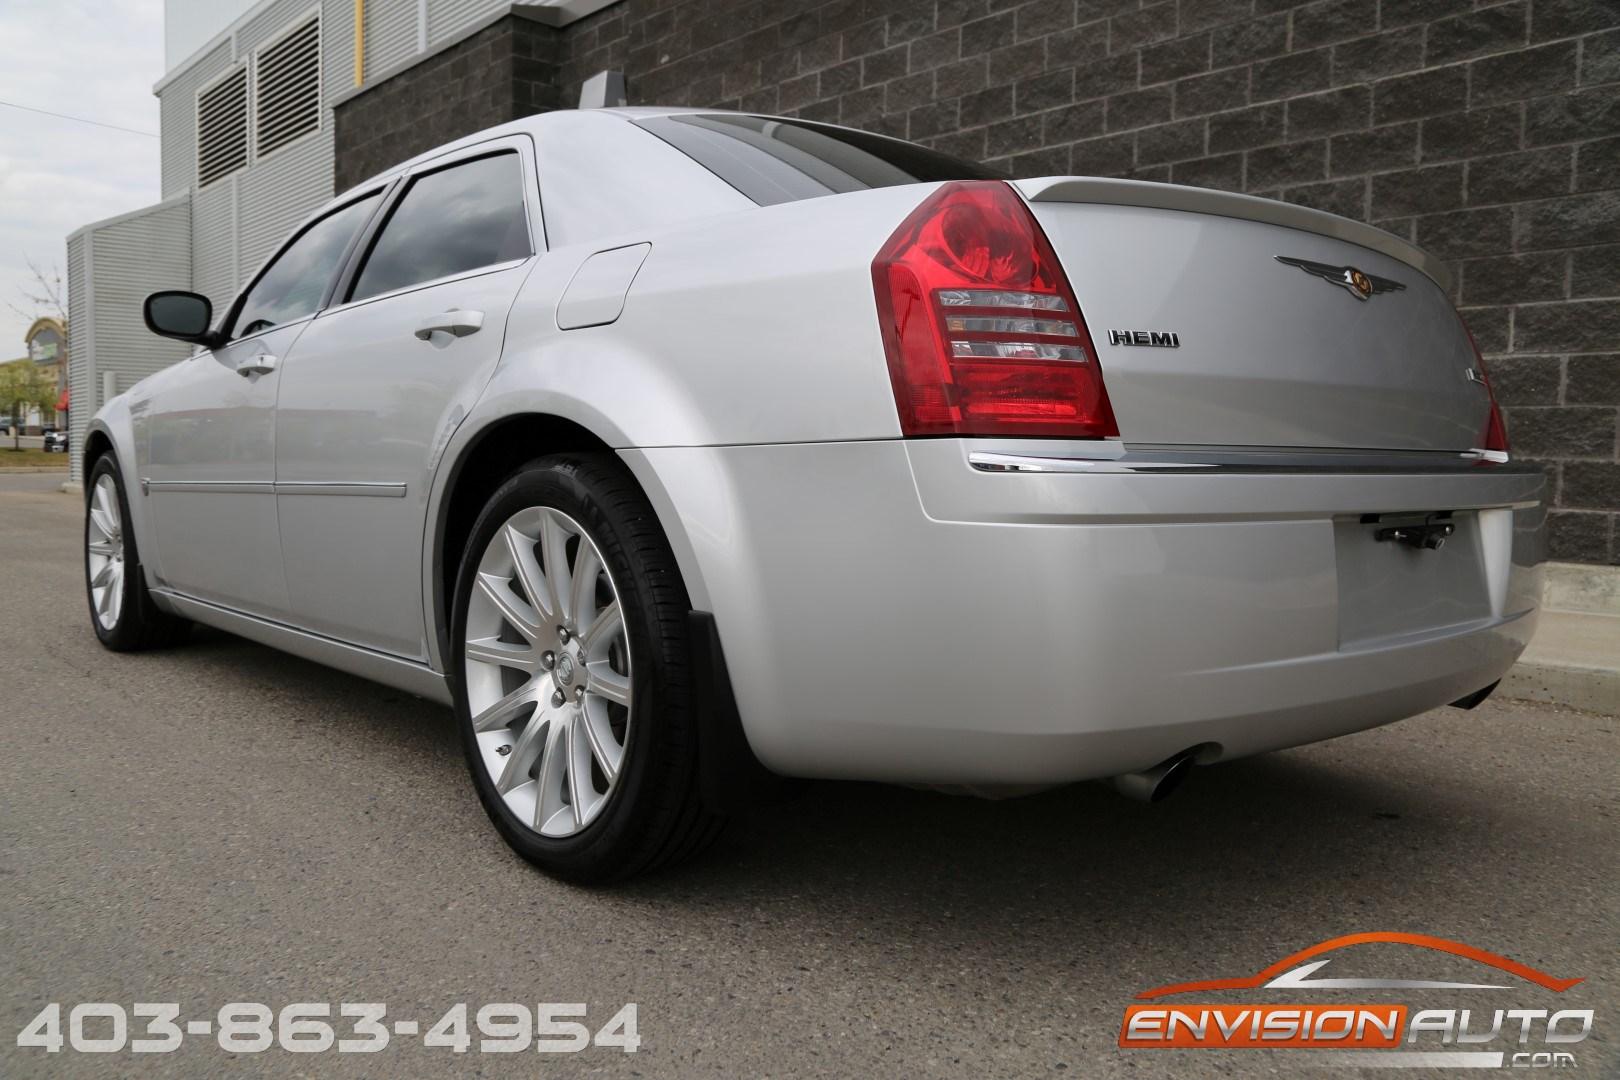 2007 Chrysler 300c 5 7l Hemi Only 40kms Envision Auto